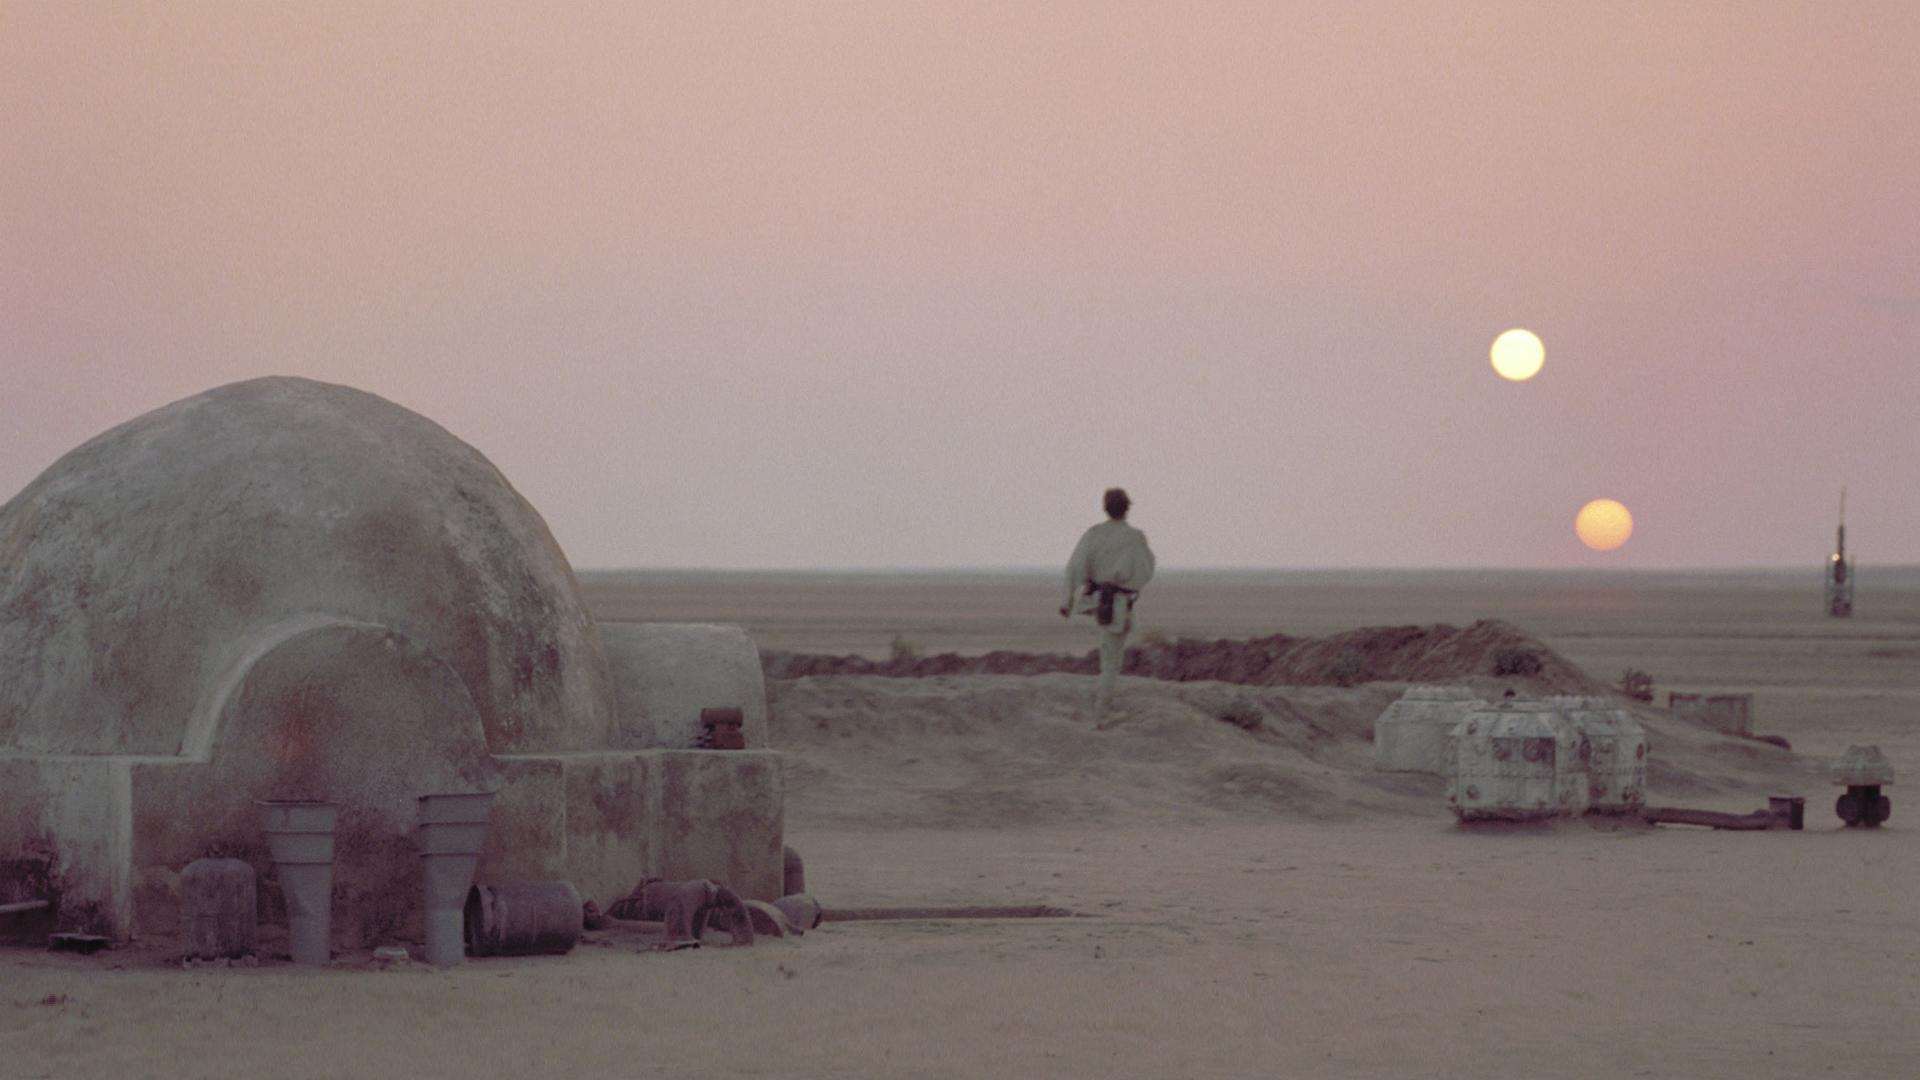 Classic Star Wars Luke on Tatooine [1920x1080] iimgurcom 1920x1080